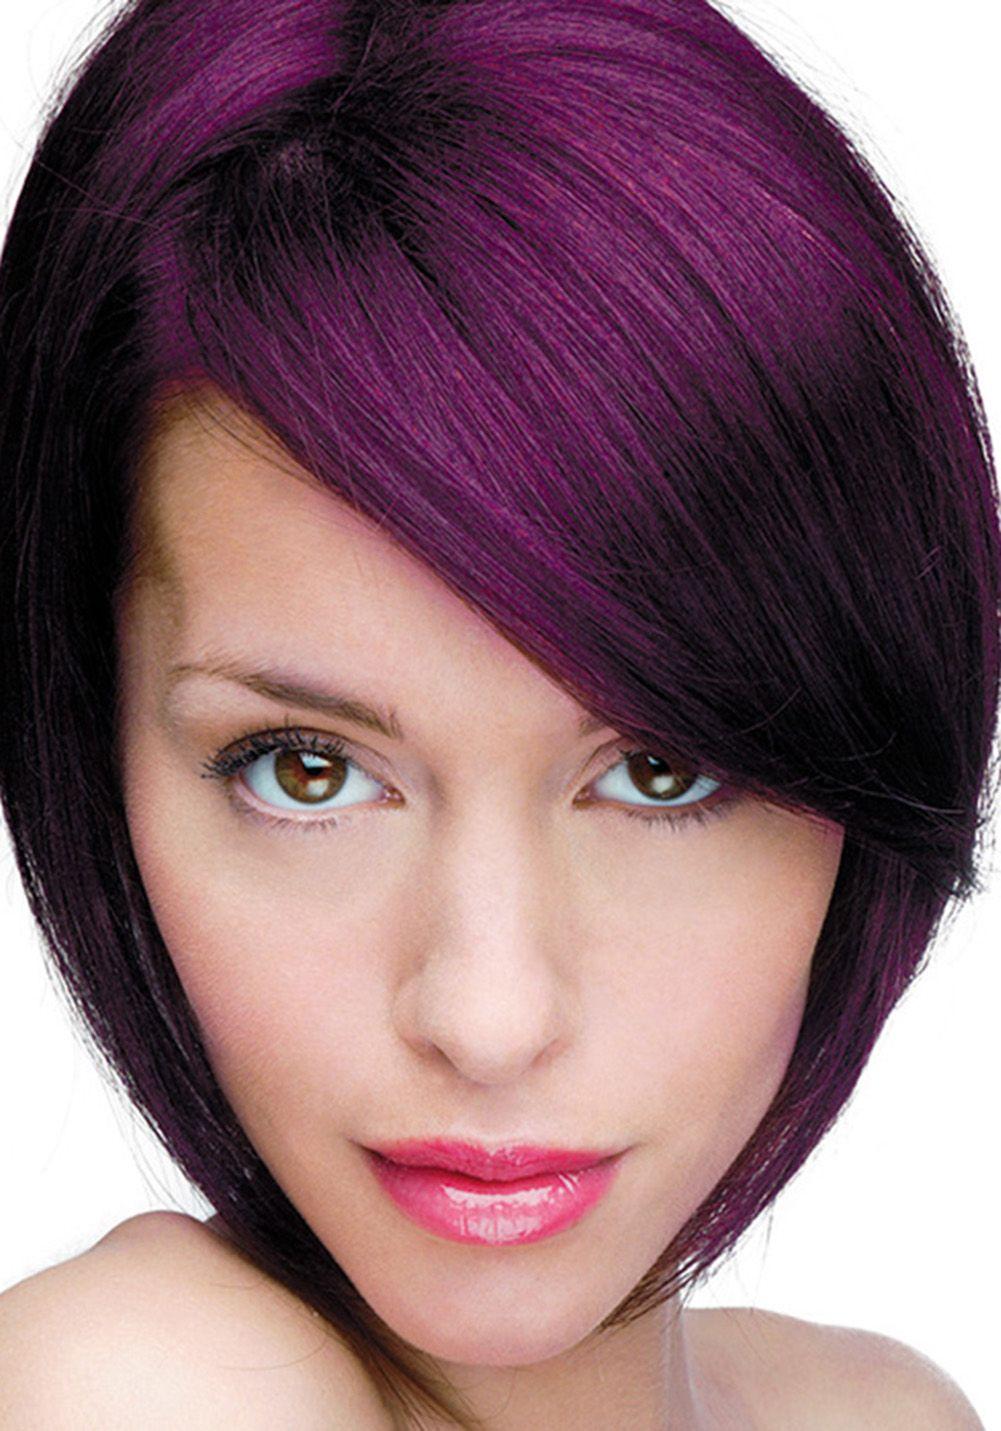 dark redish purple hair - google